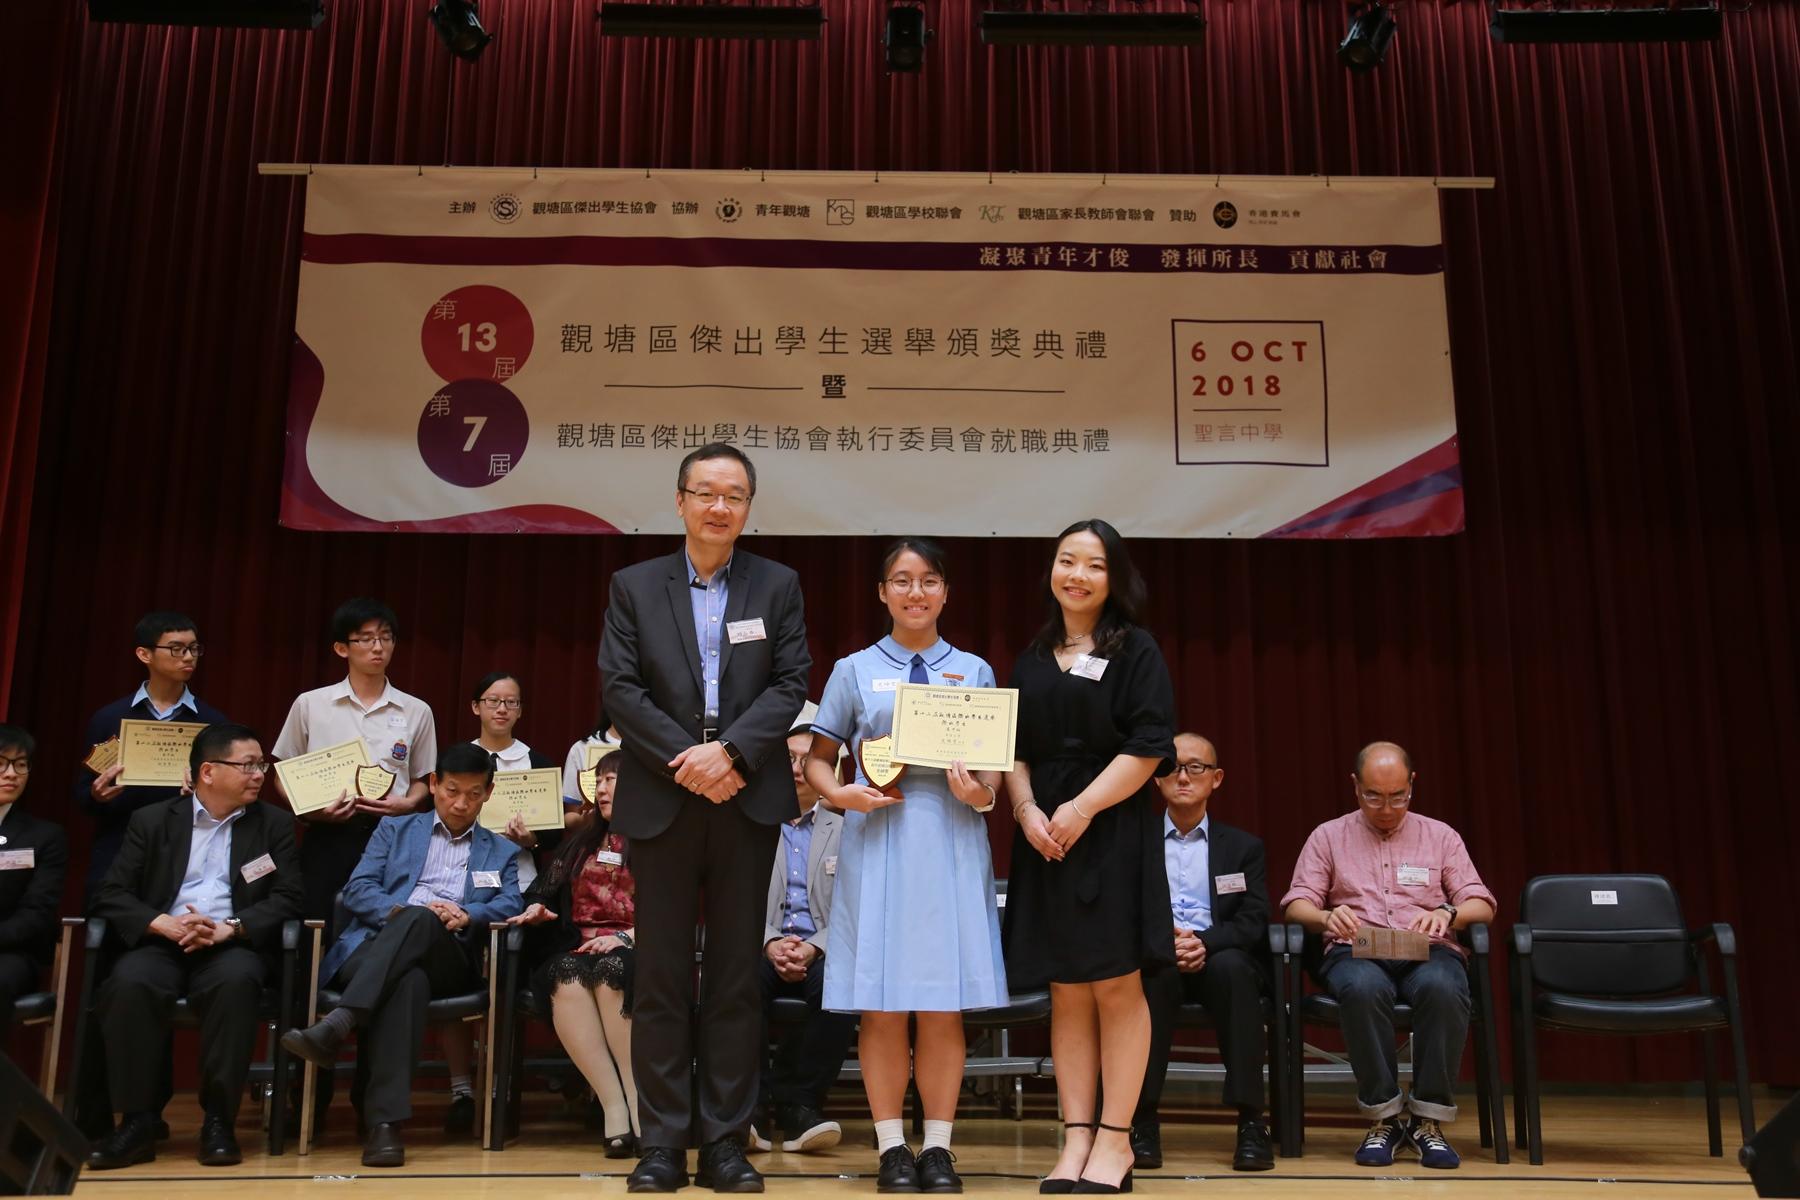 http://npc.edu.hk/sites/default/files/10801958560_img_0662.jpg